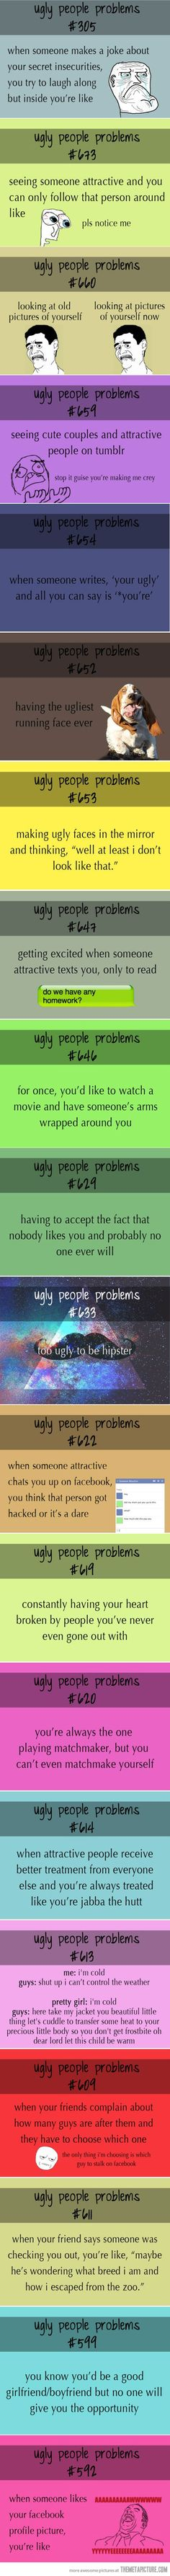 Sad but true... Funny though!